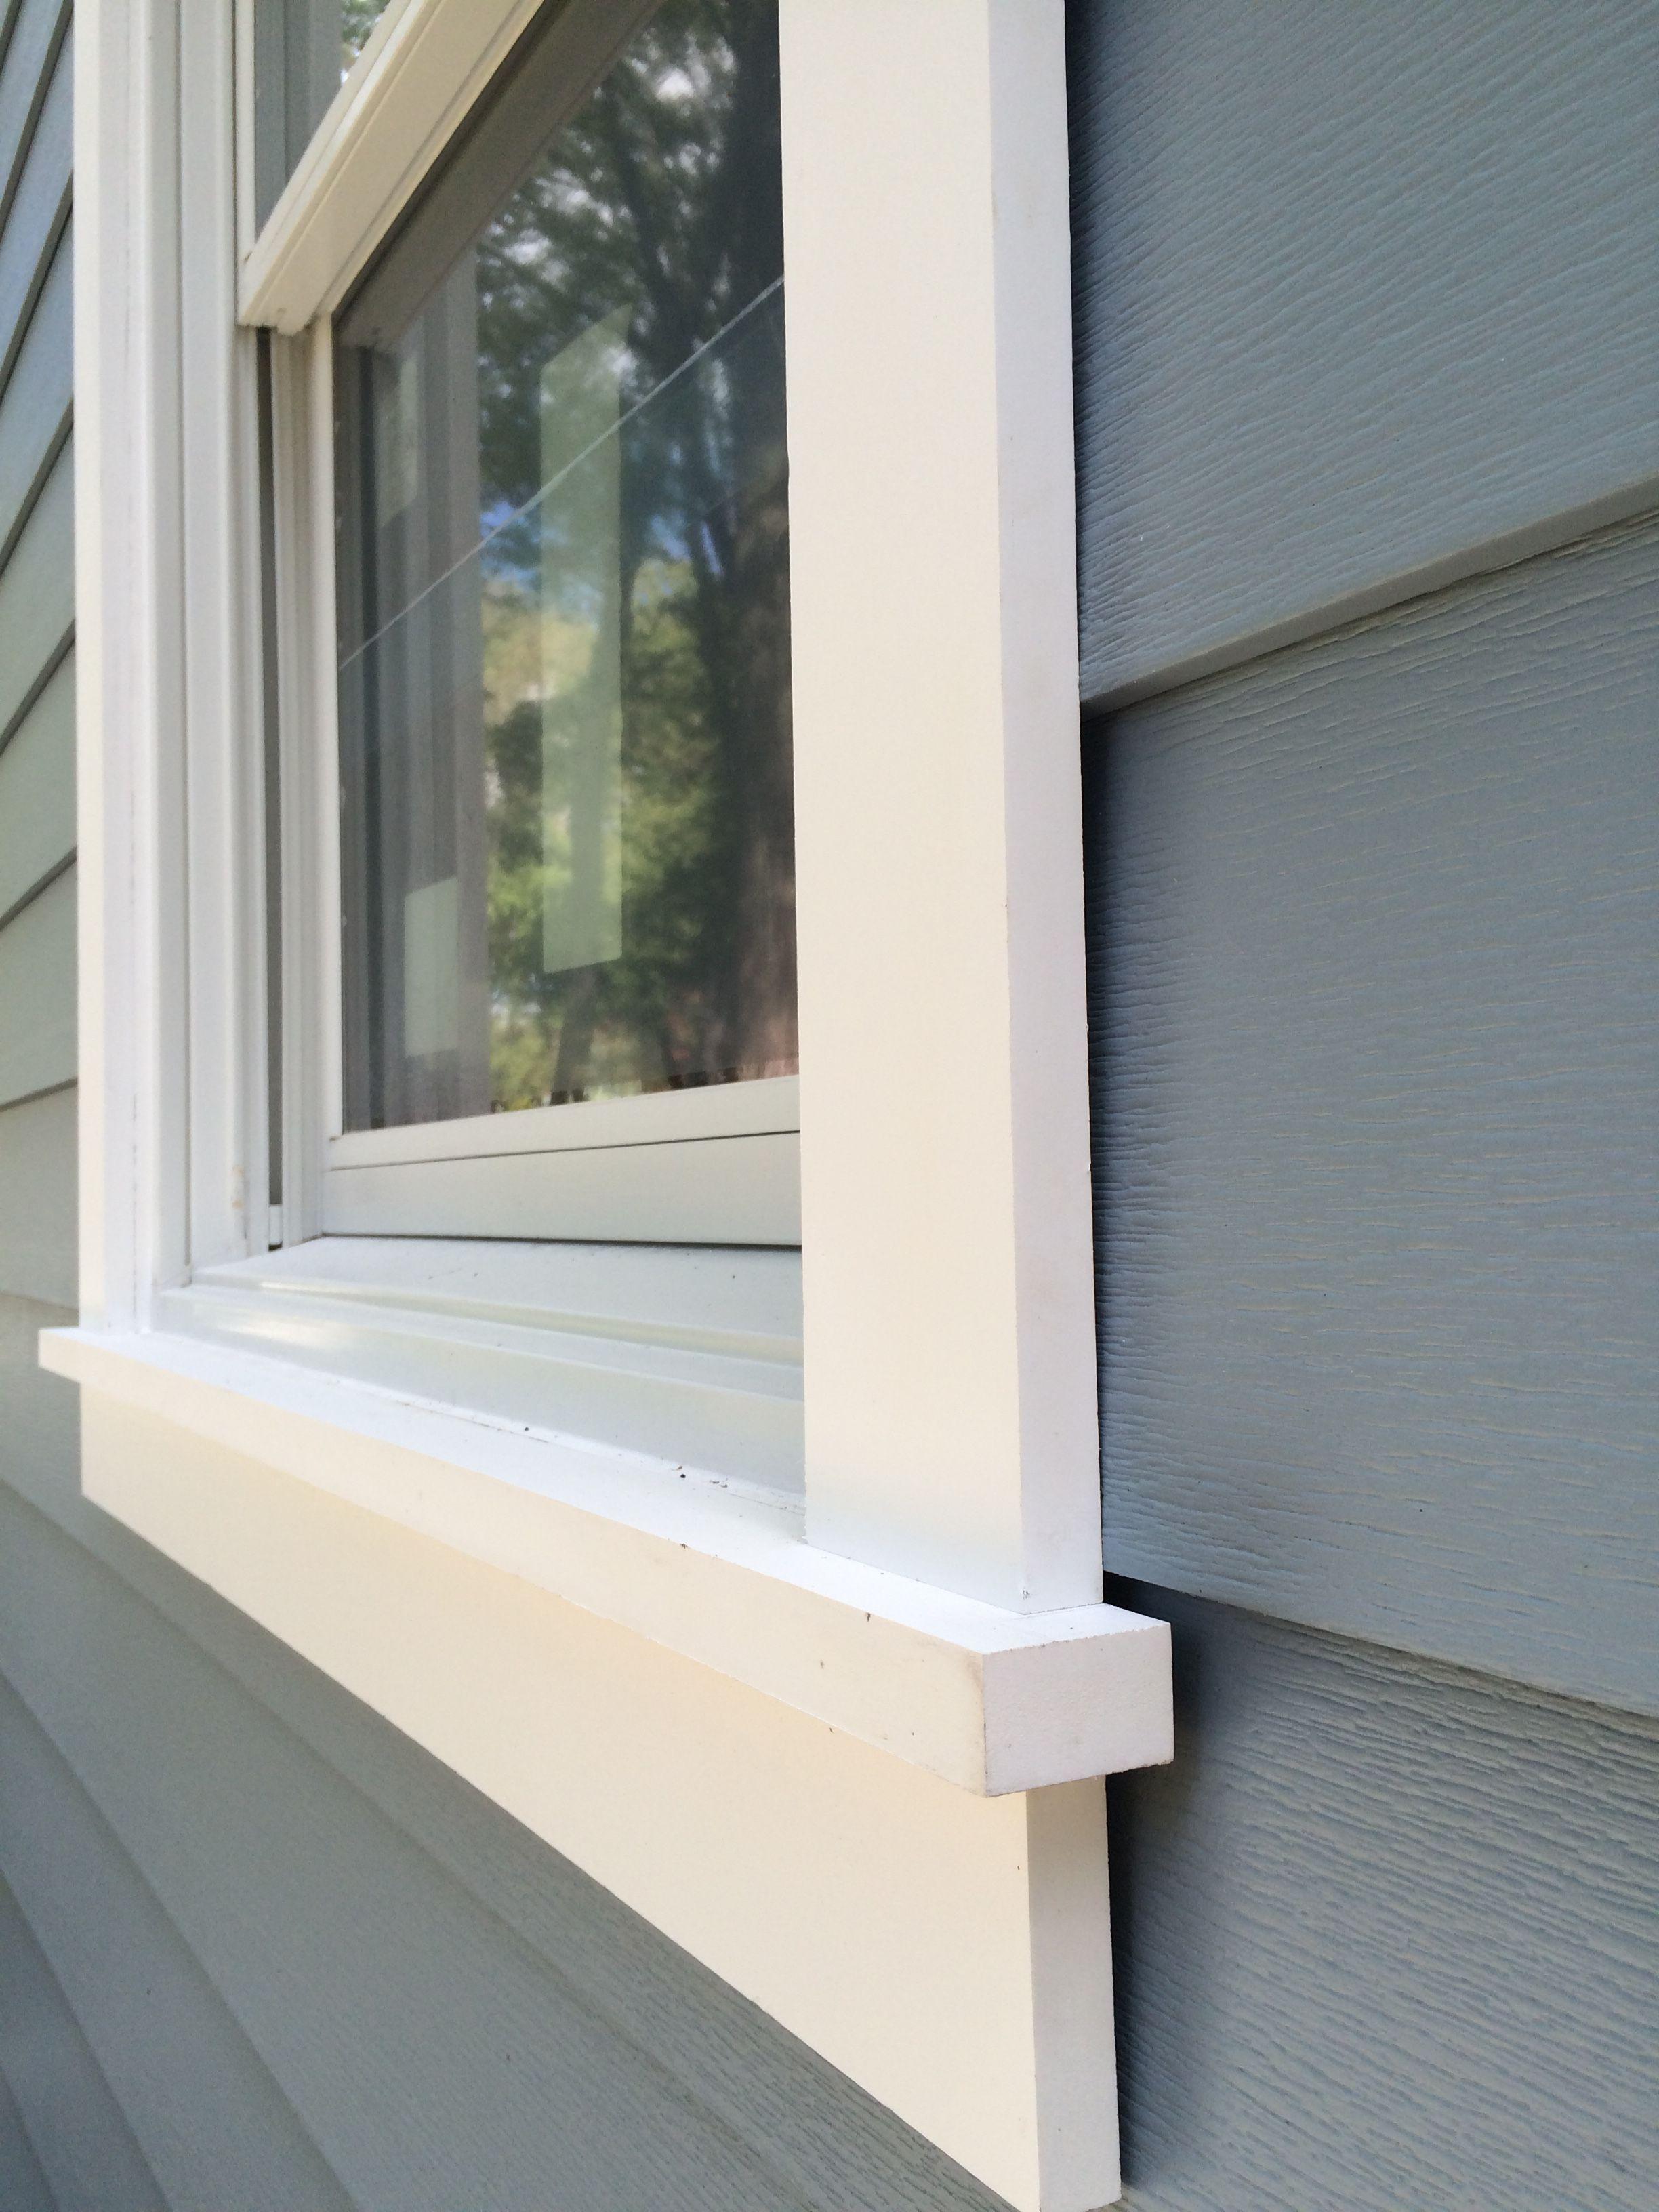 Steps Lighting Flowers Porch 973 795 1627 Vinyl Siding Install Vinyl Siding Window Trim Exterior Outdoor Window Trim House Paint Exterior